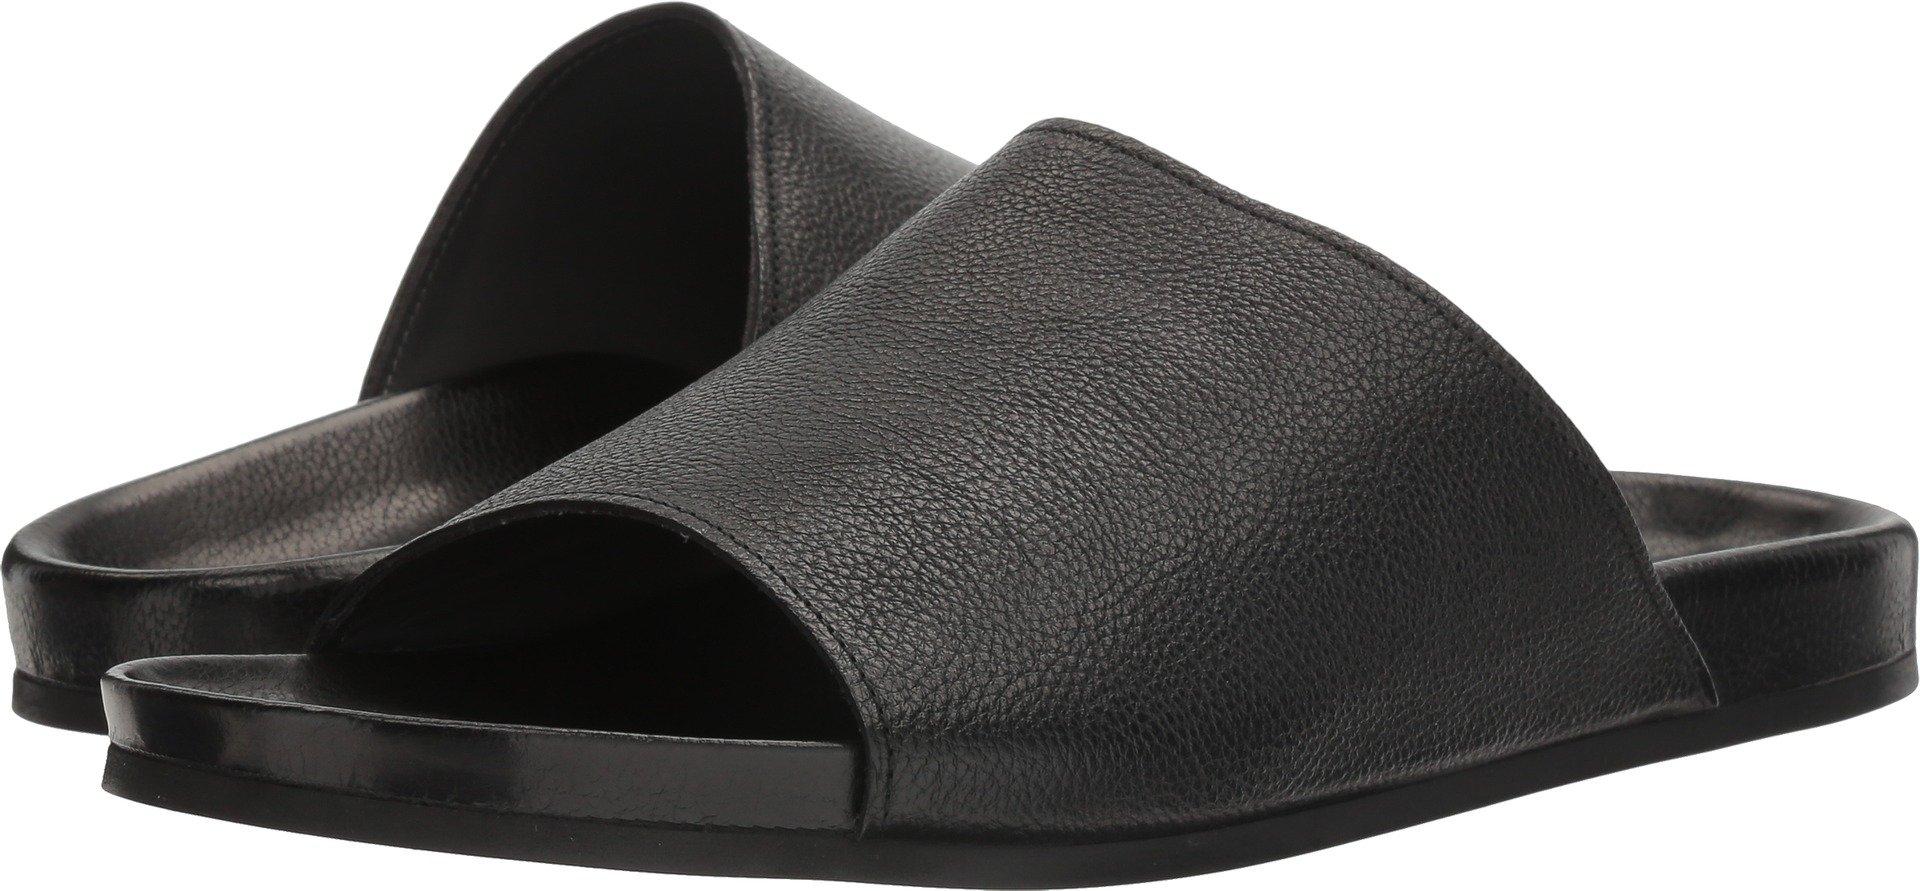 To Boot New York Men's Whitman Slide Sandal, Nappa Sport Nero, 8 M US